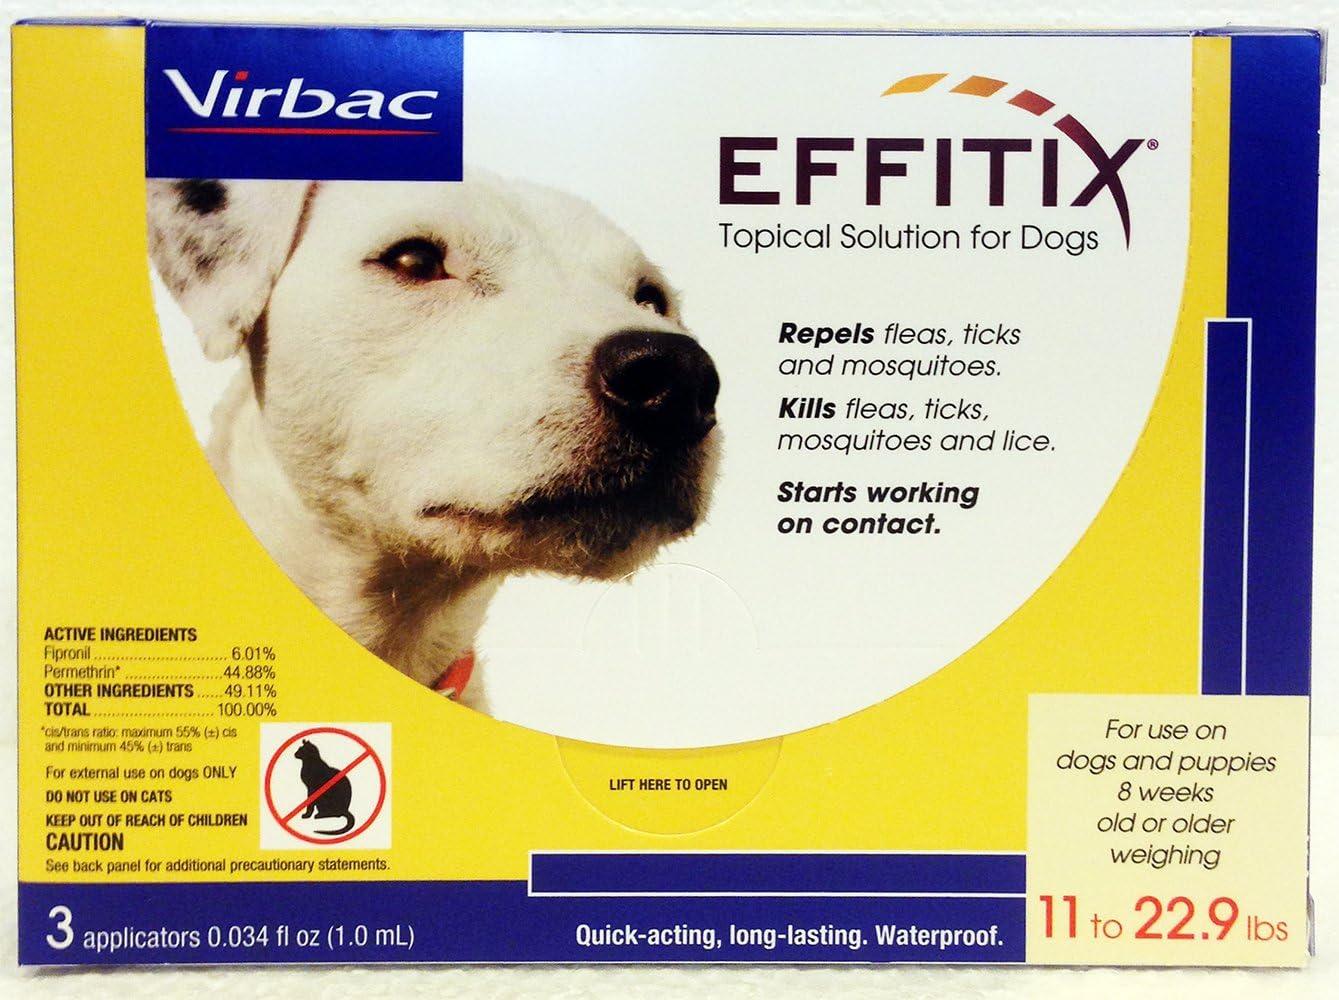 Virbac Effitix Flea/ Tick